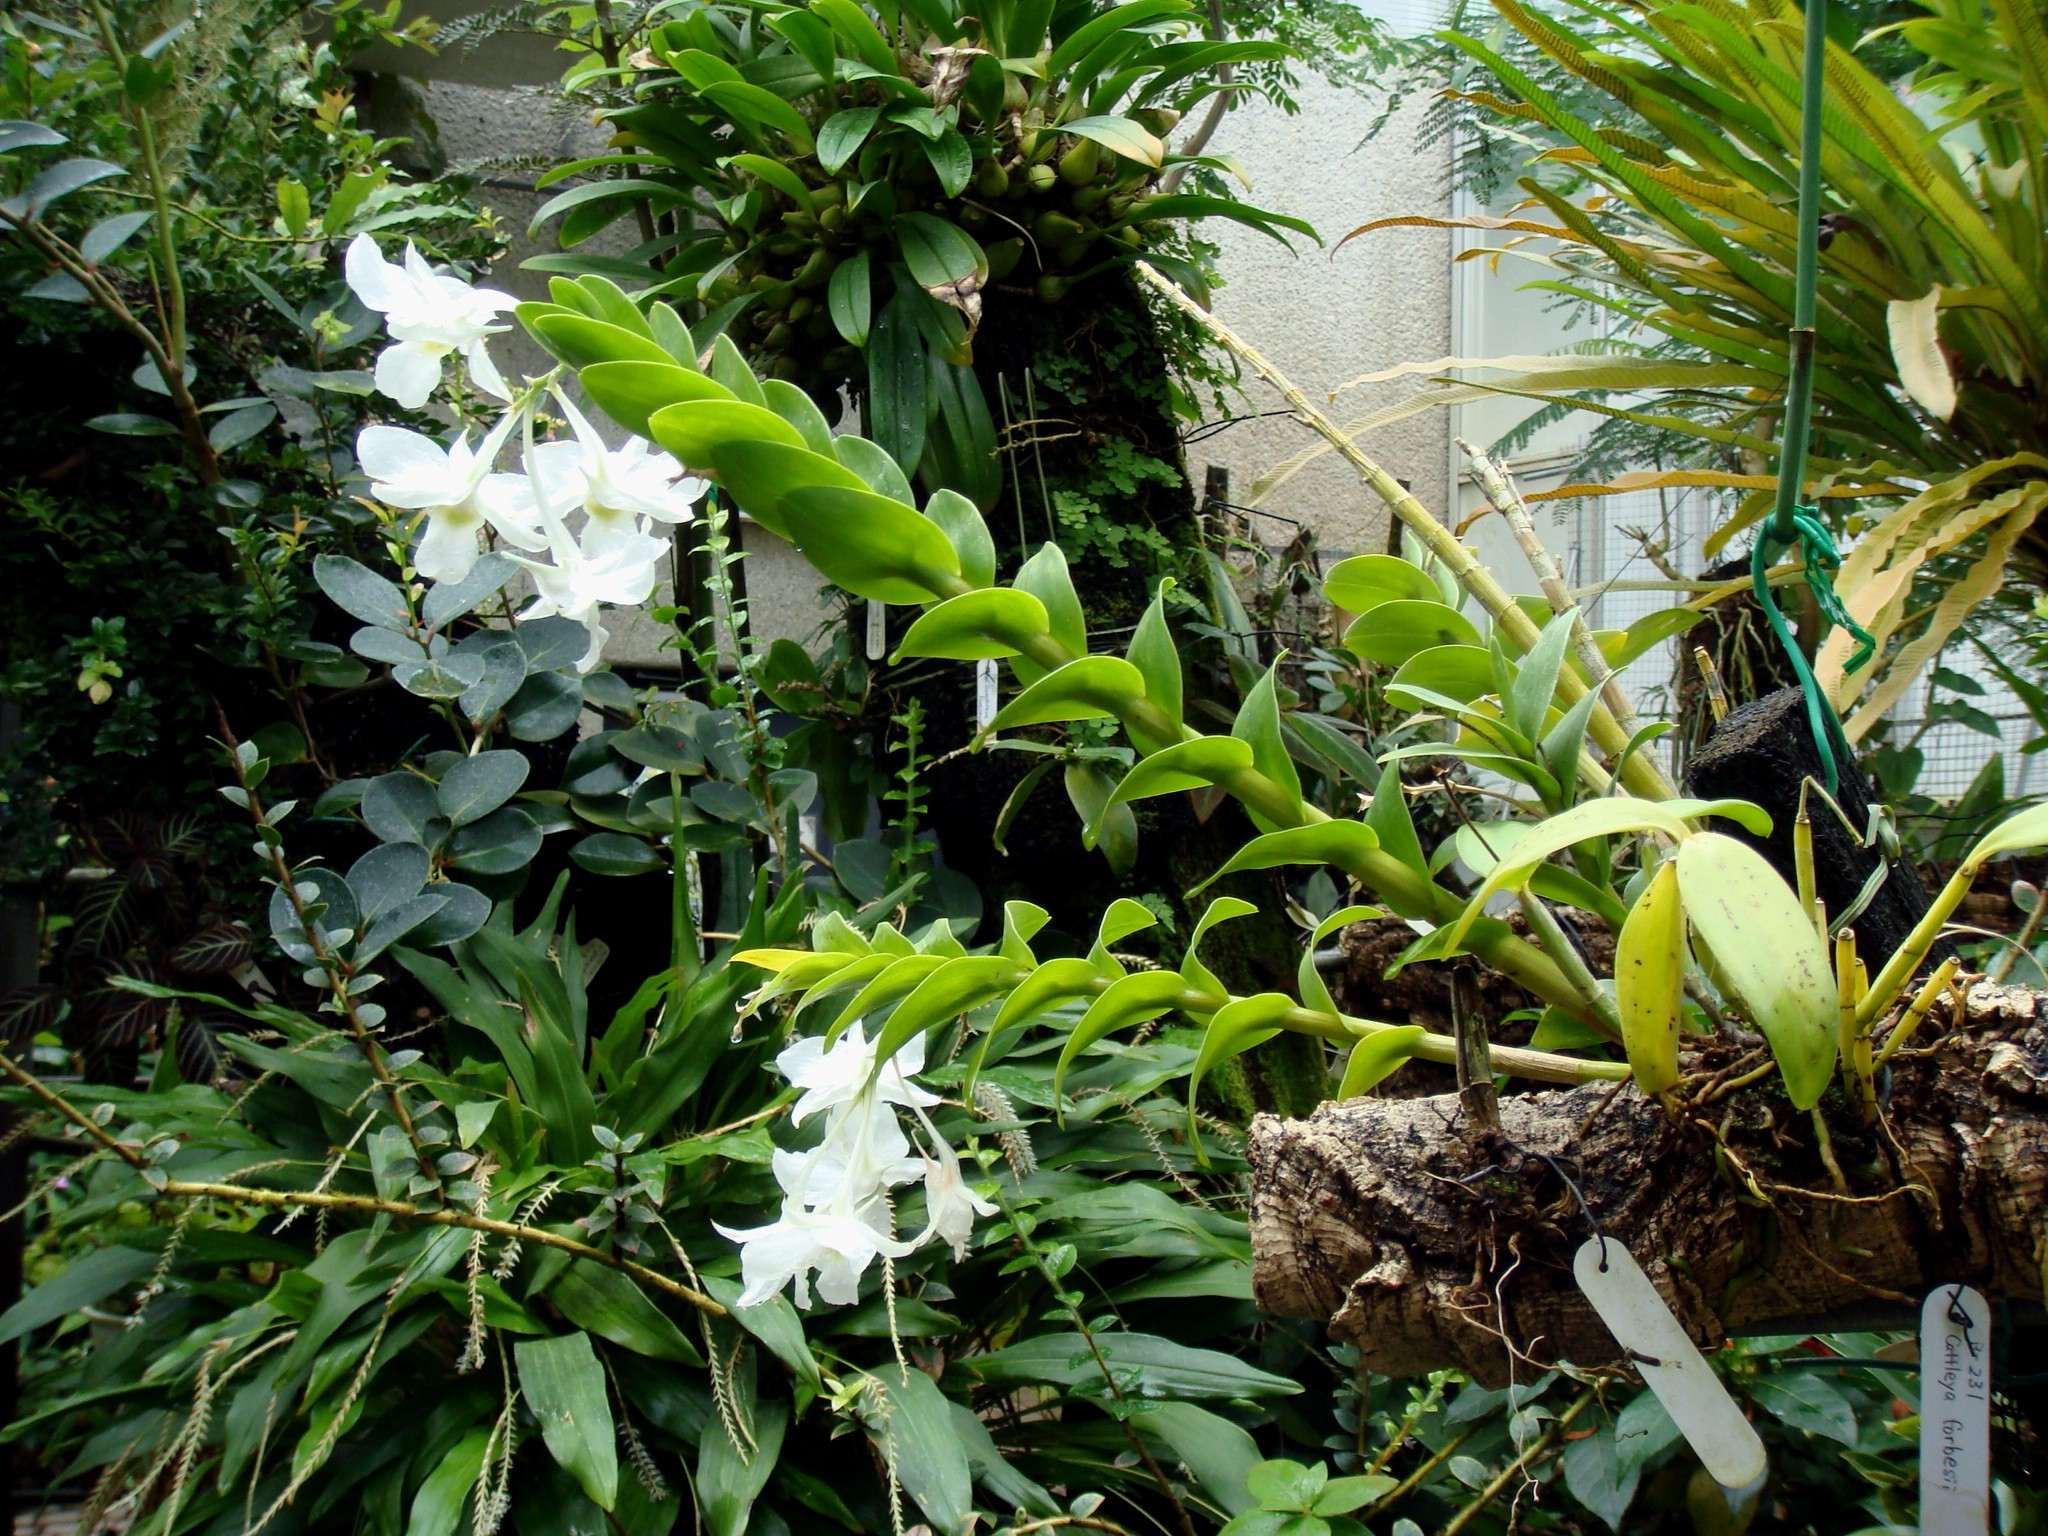 http://orchids.la.coocan.jp/Dendrobium/Dendrobium%20dearei/DSC00278.JPG